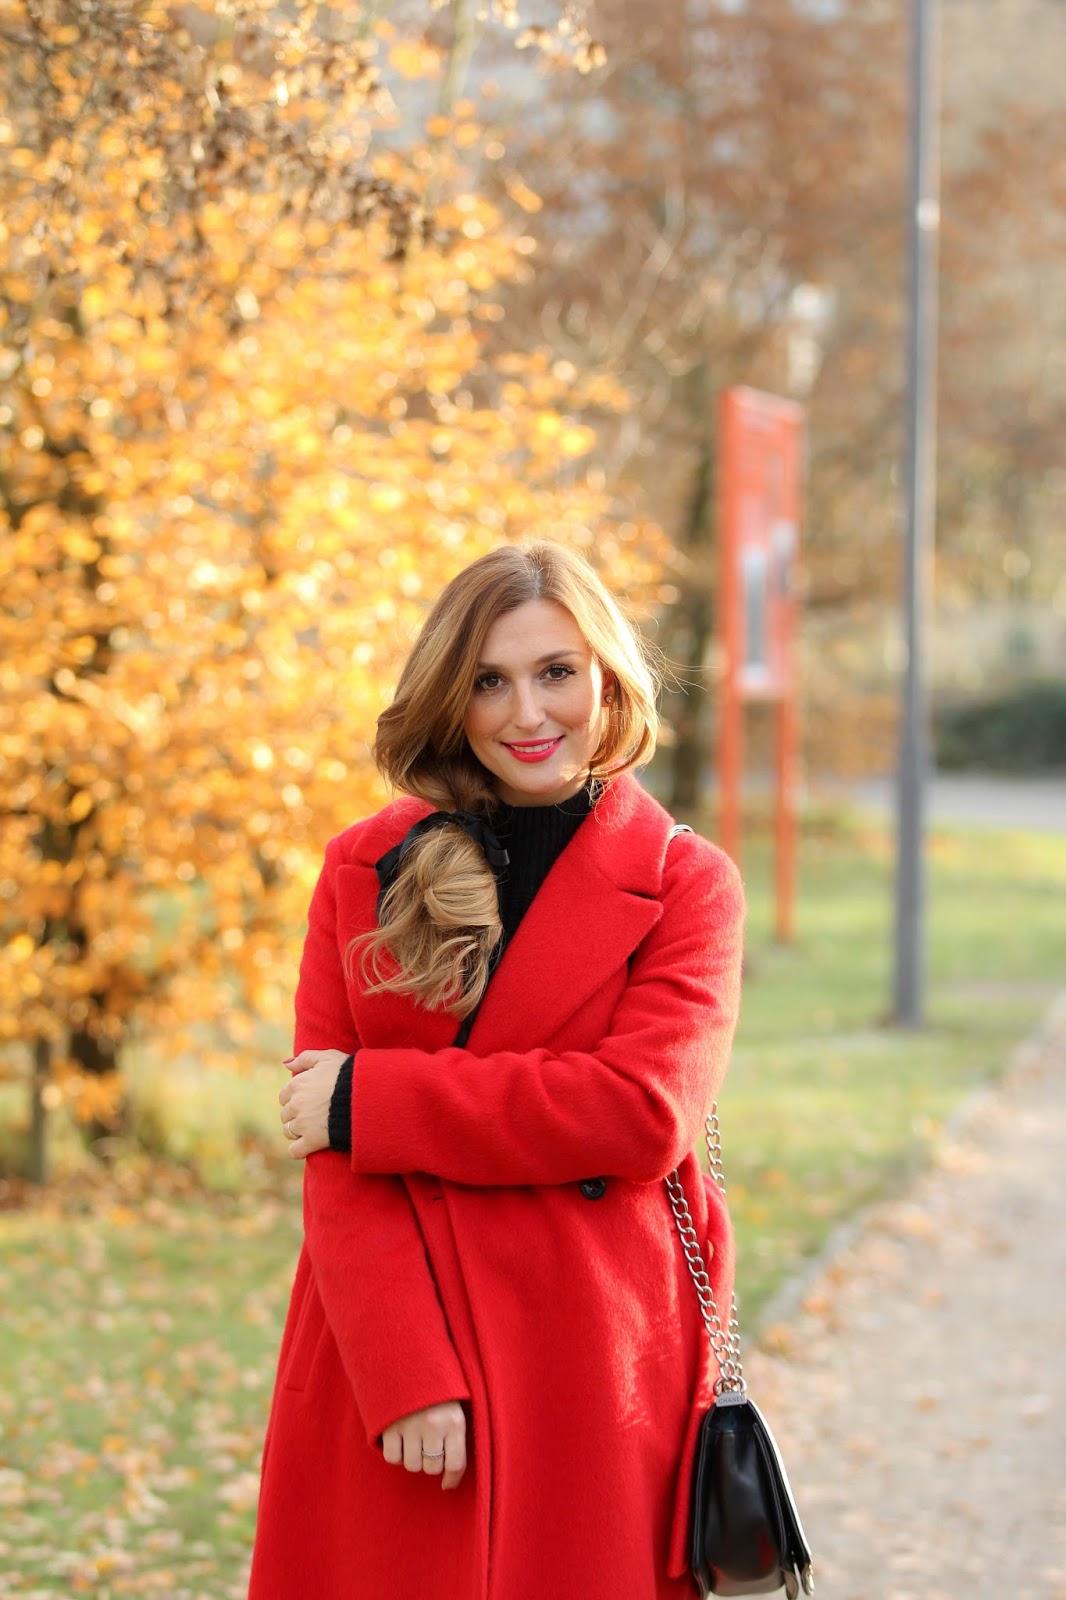 -fashionblog-muenchen-munich-blogger-fashionblogger-bloggerdeutschland-lifestyleblog-modeblog-Frankfurt-germanblogger-styleblog-bundfaltenhose-a-la-streetwear